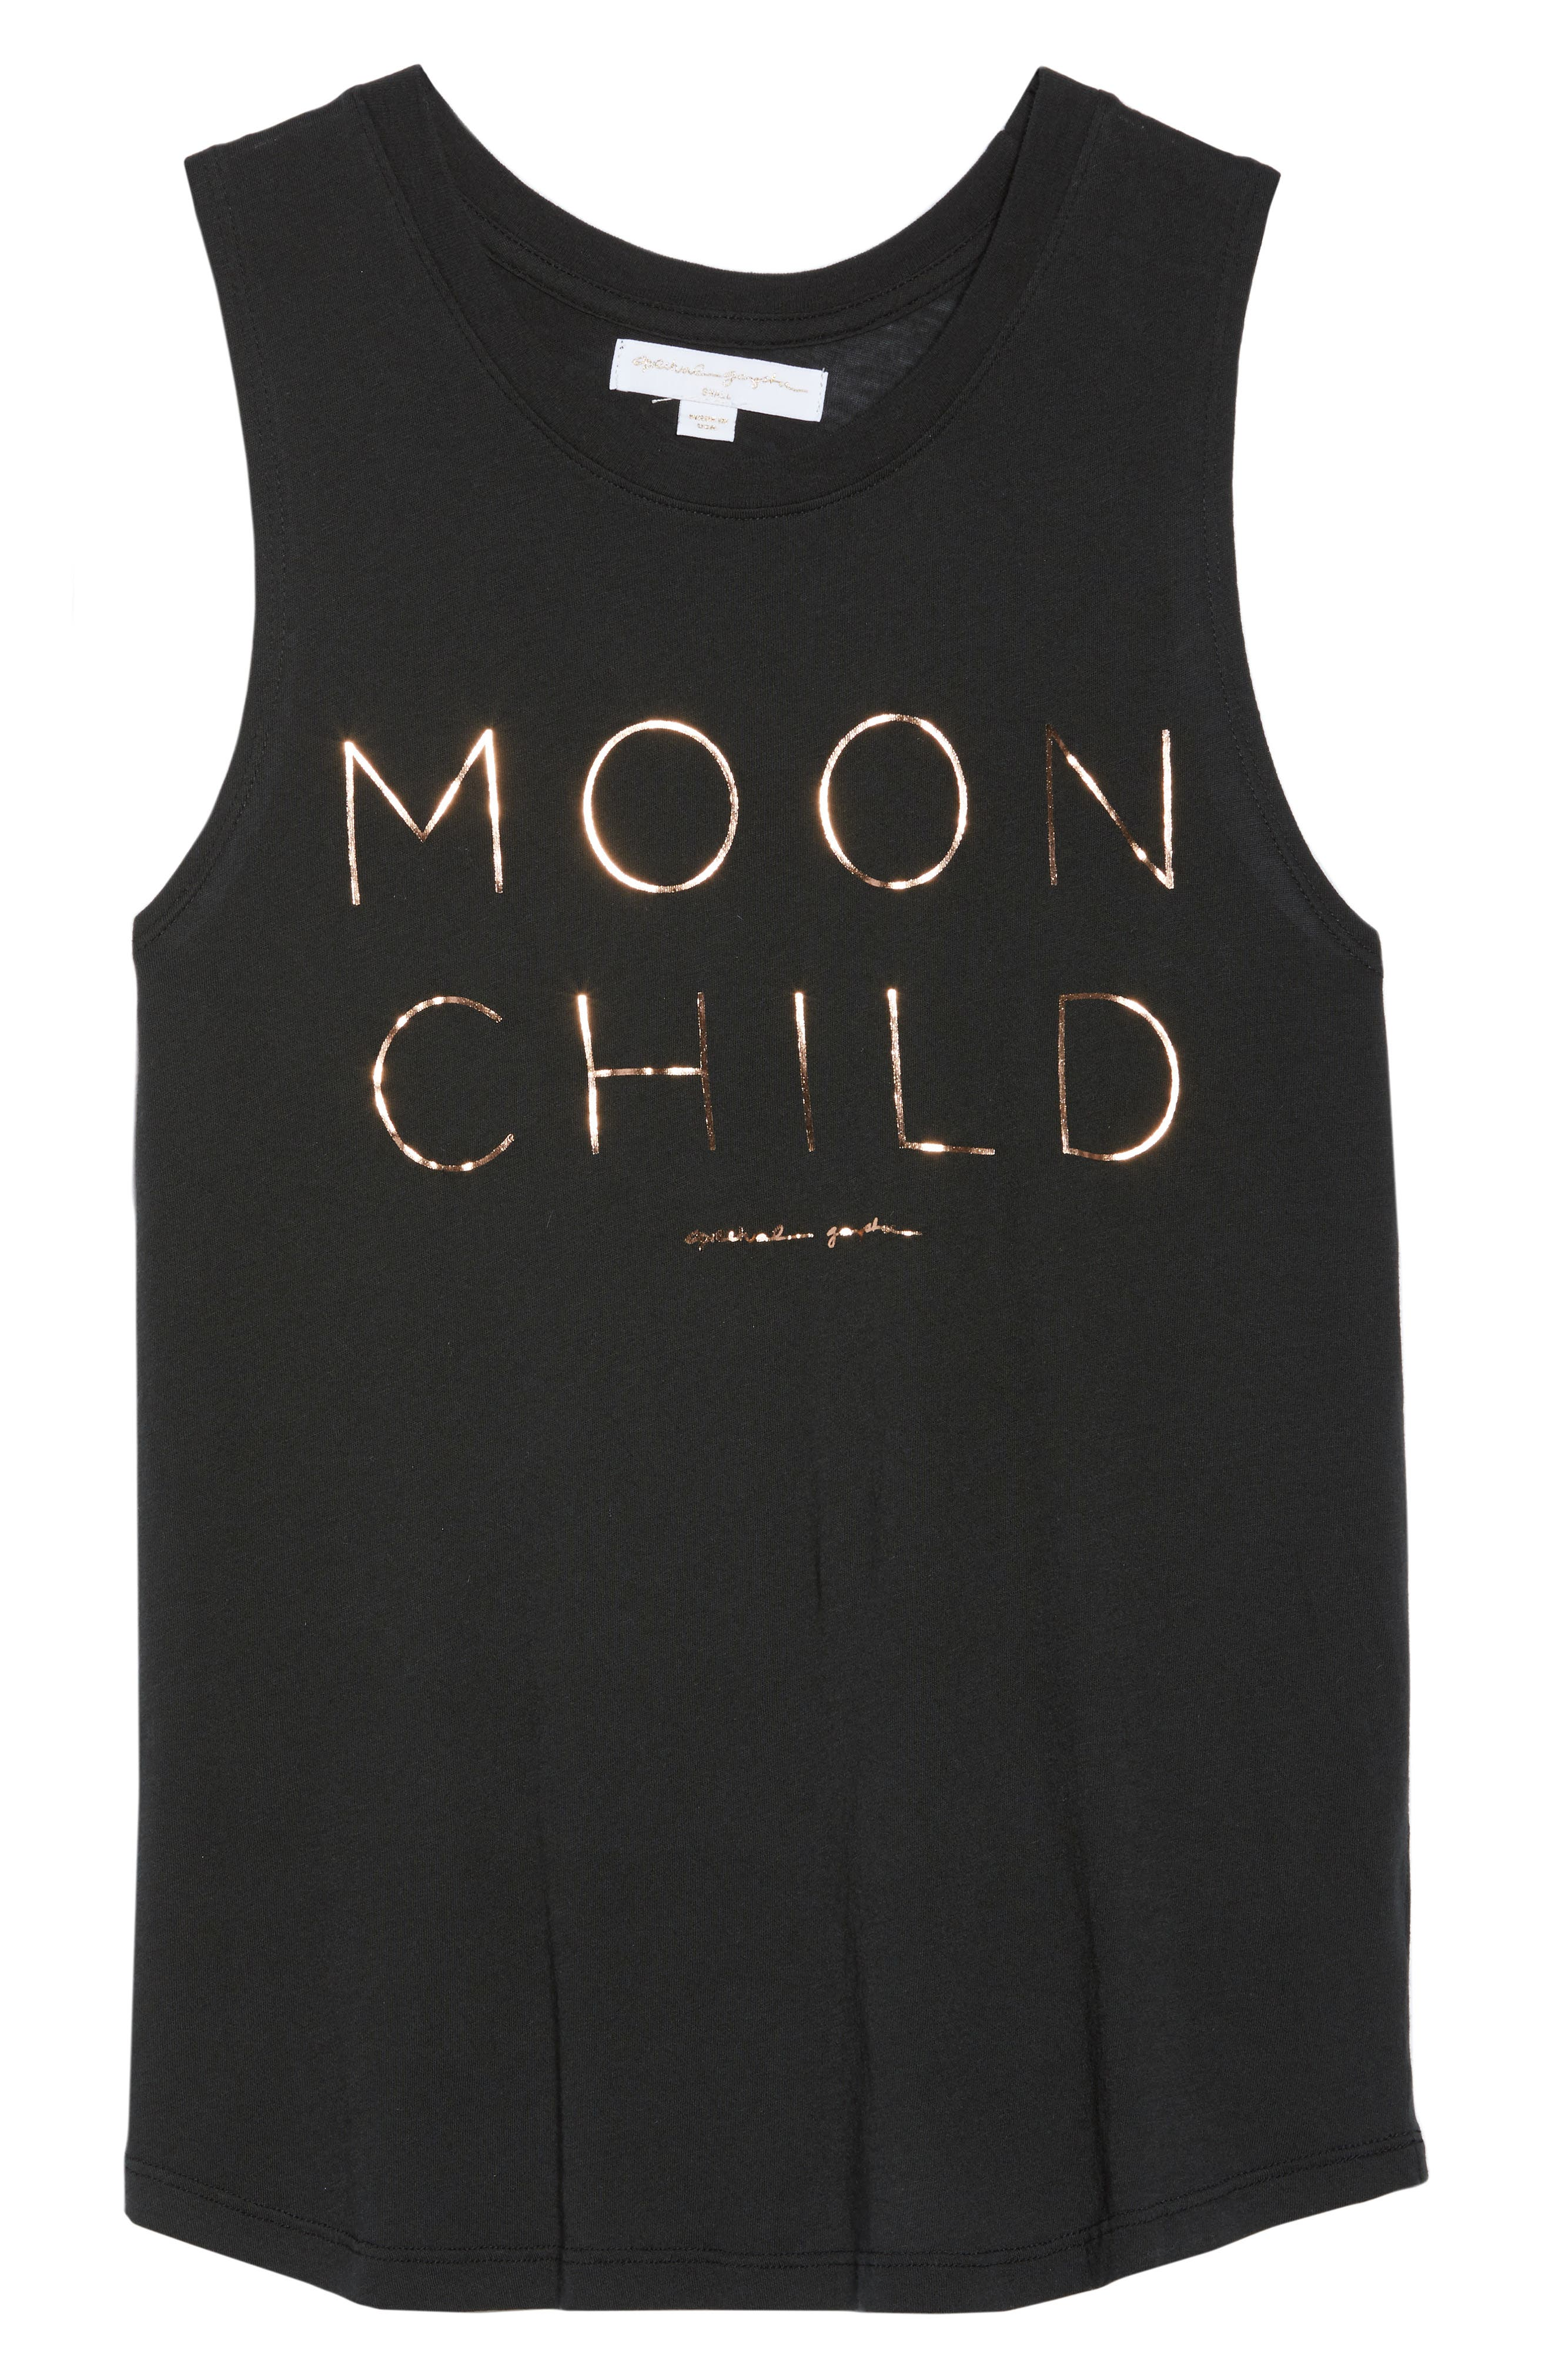 Moon Child Tank,                             Alternate thumbnail 6, color,                             Vntg Black